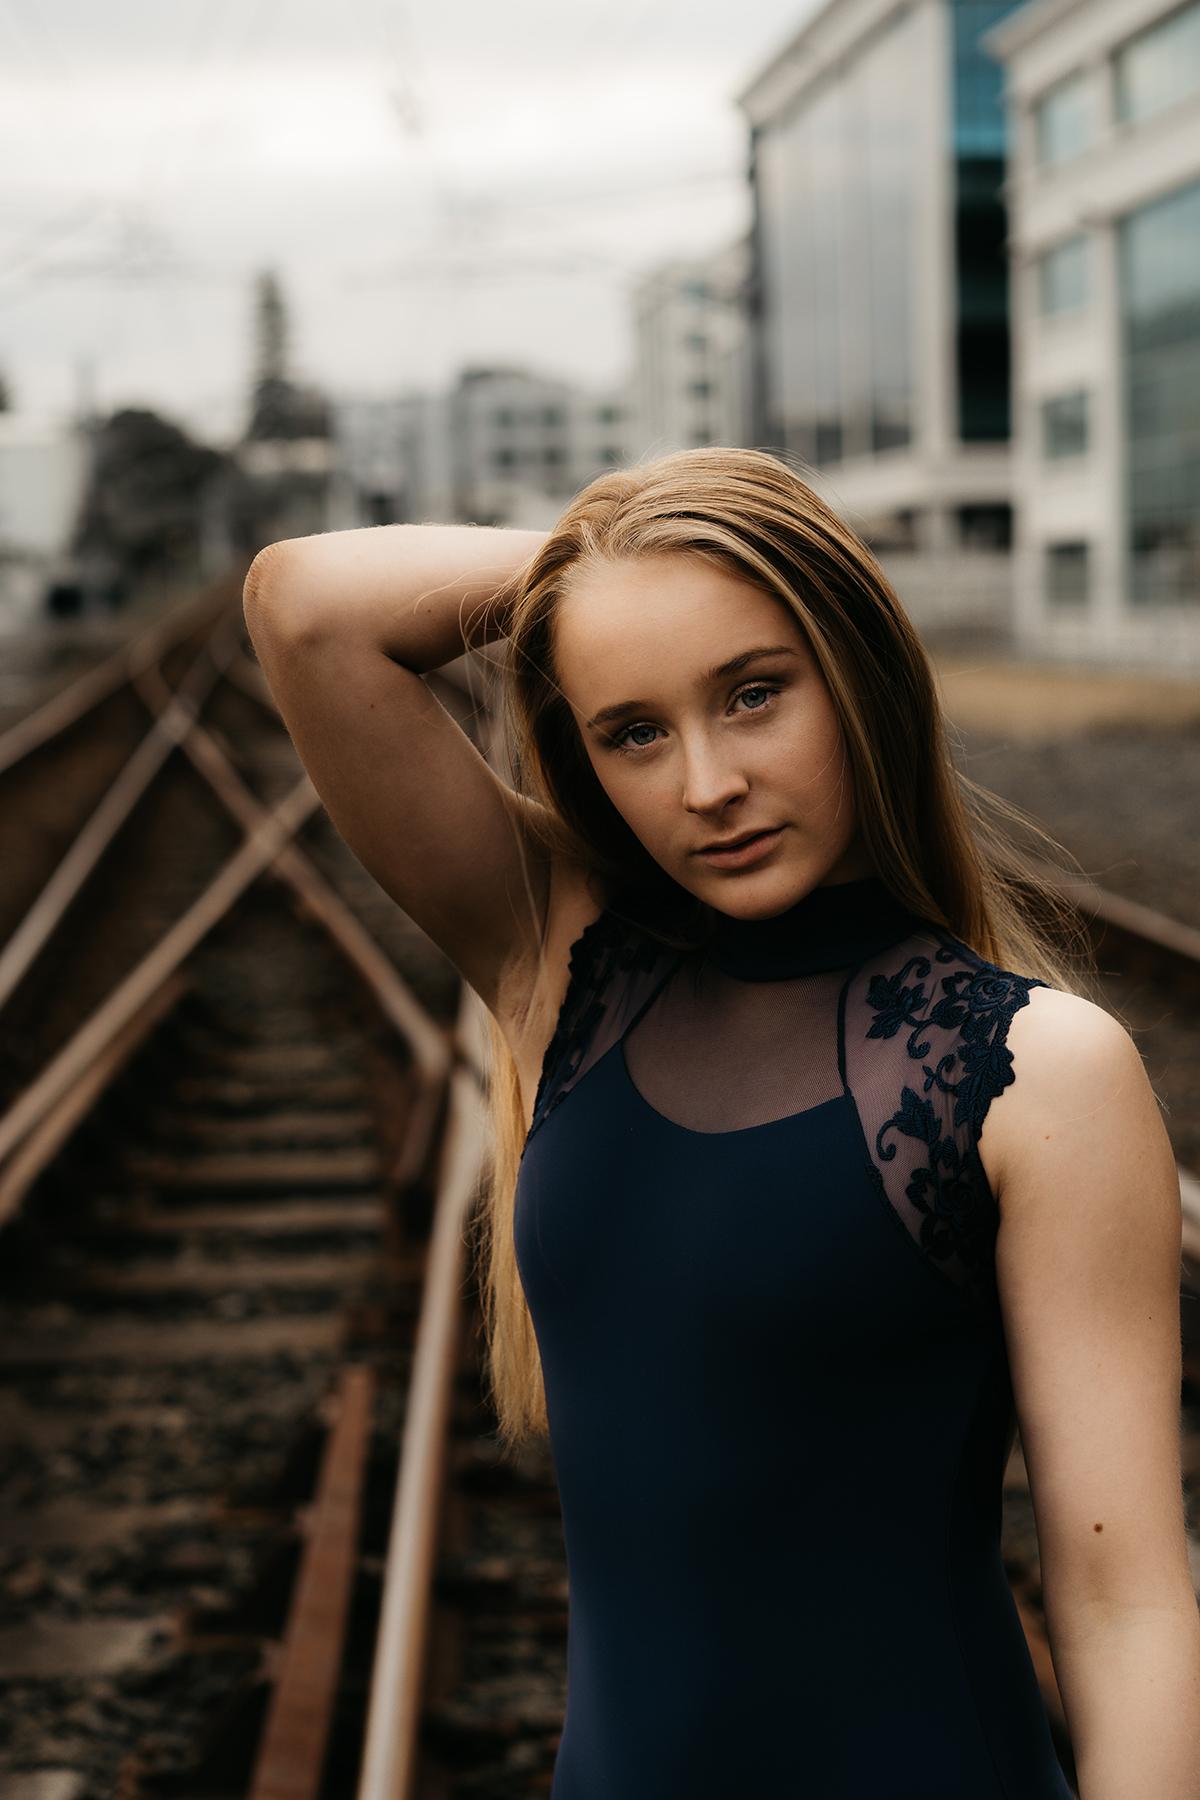 Keelia_Kennychickphotos-49.jpg